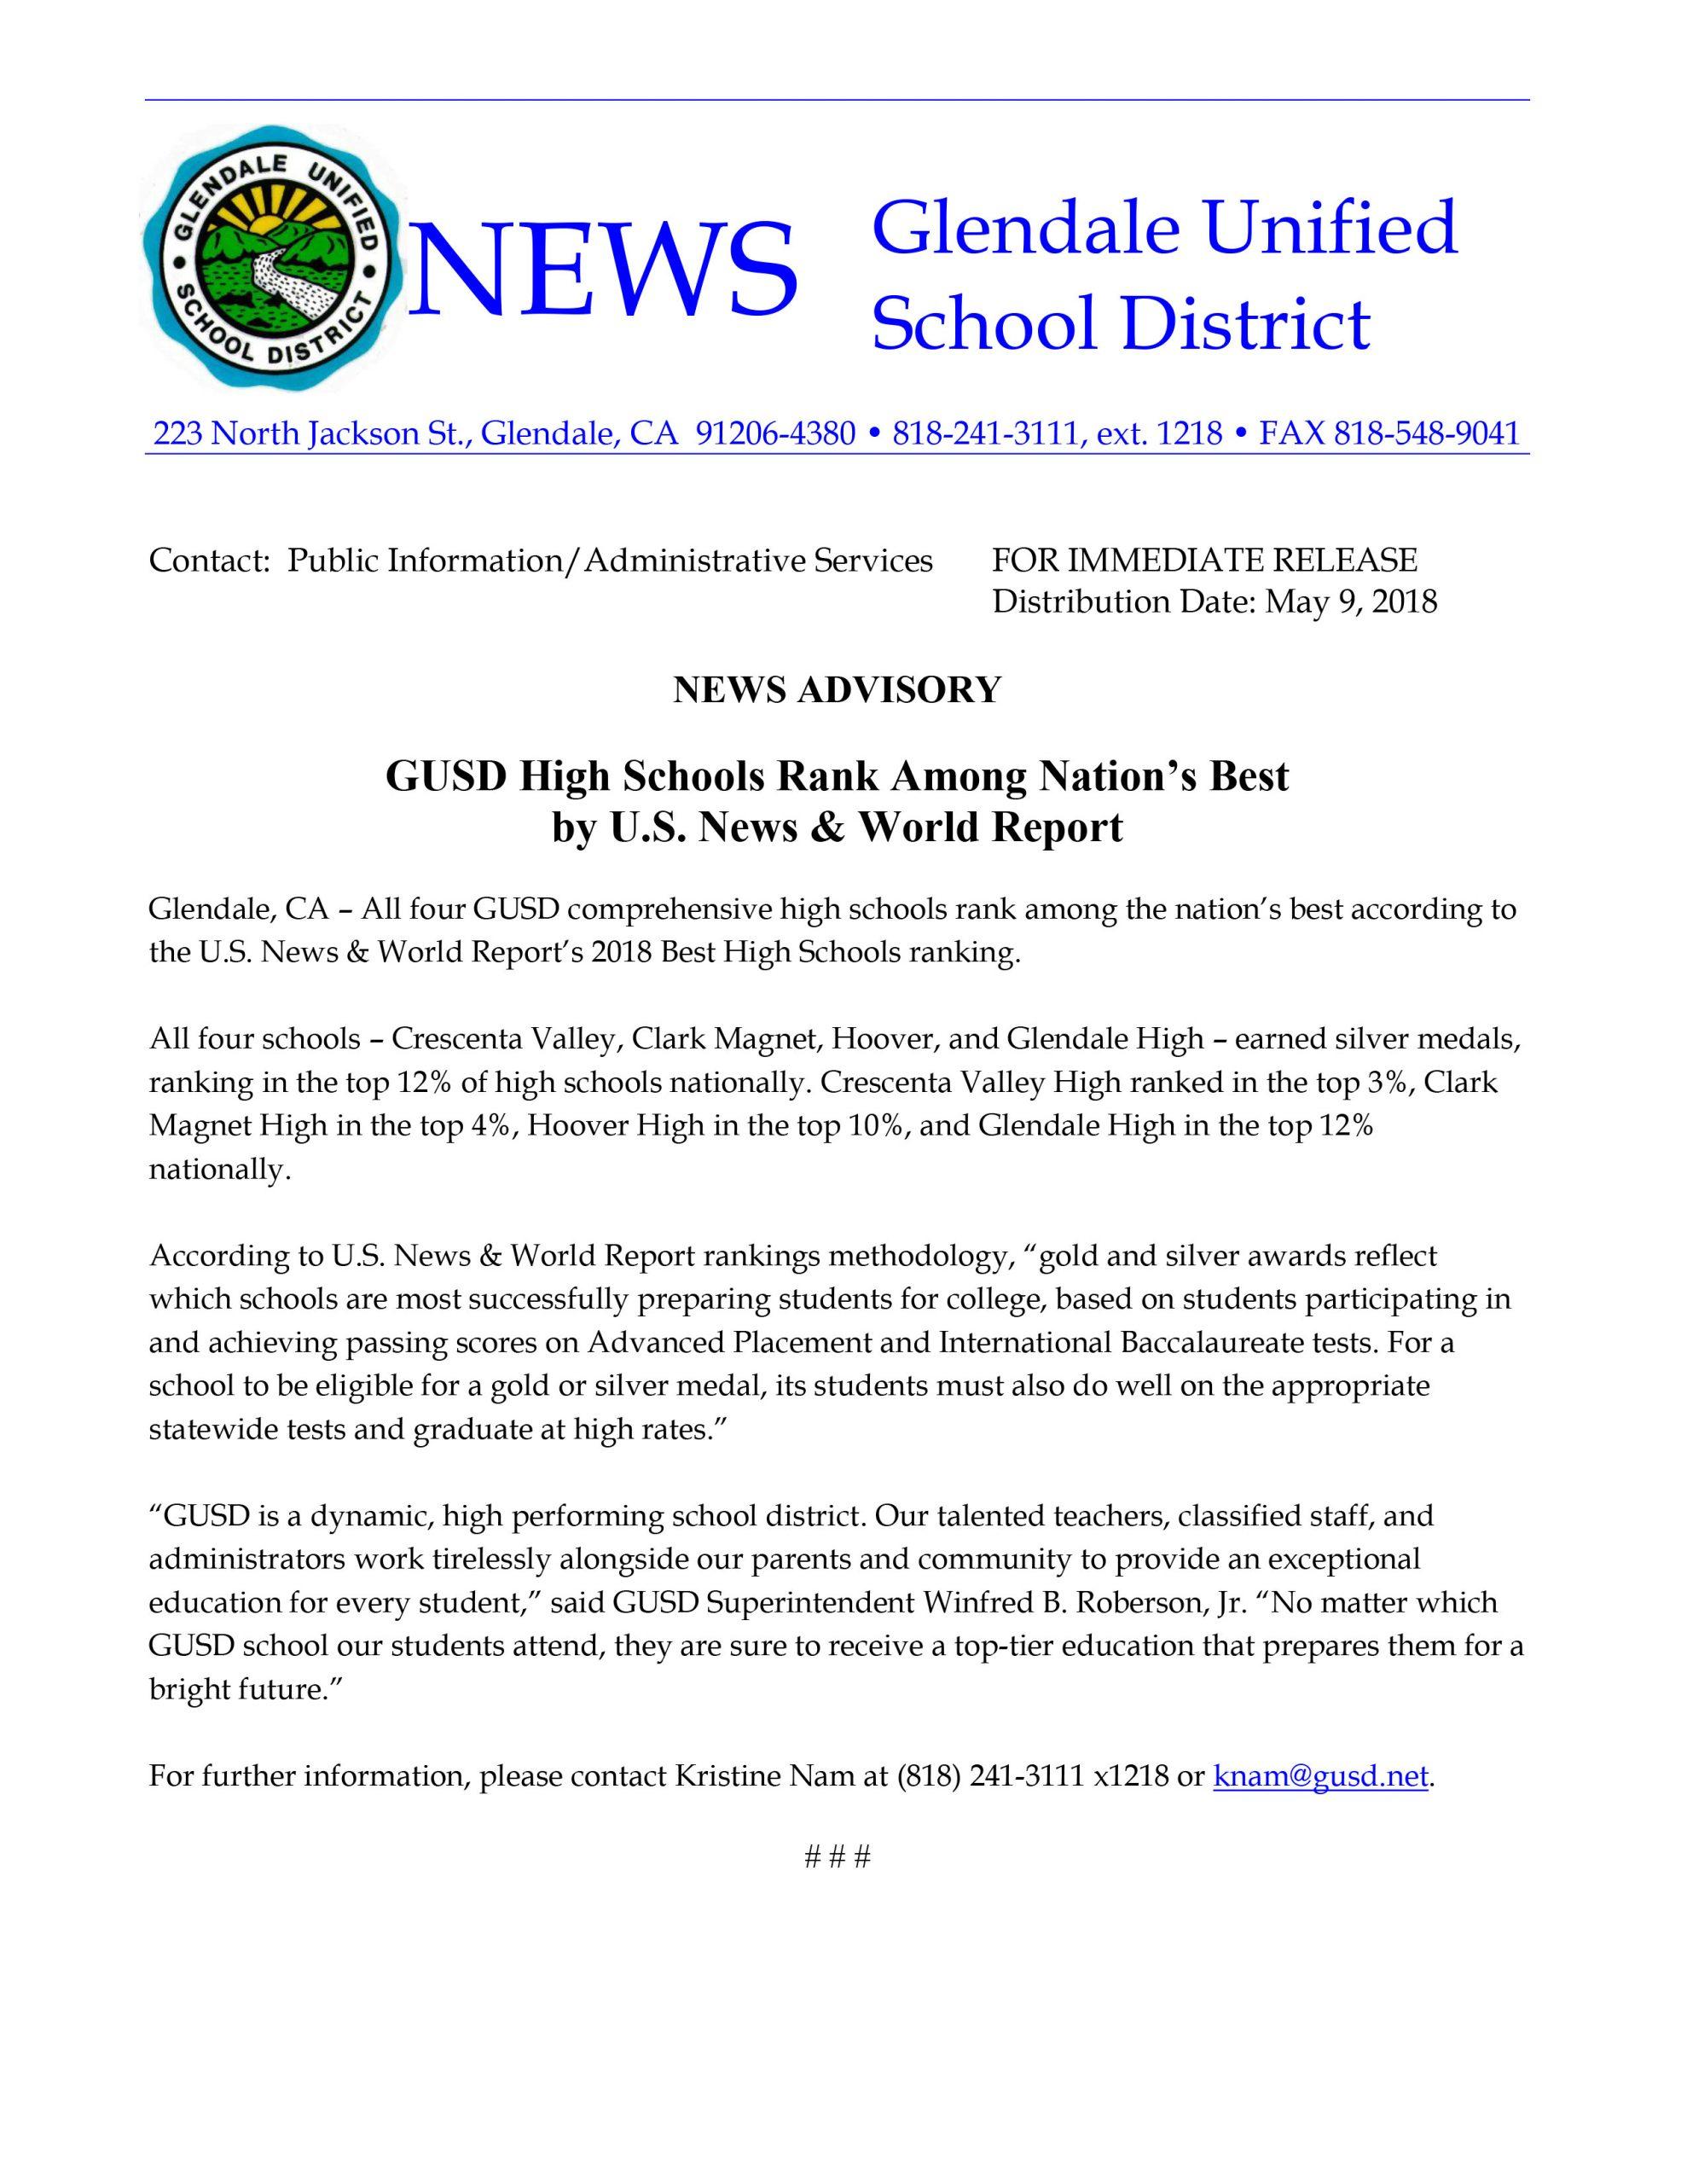 Glendale Unified School District Calendar | Printable within Mifflin County School District Calendar